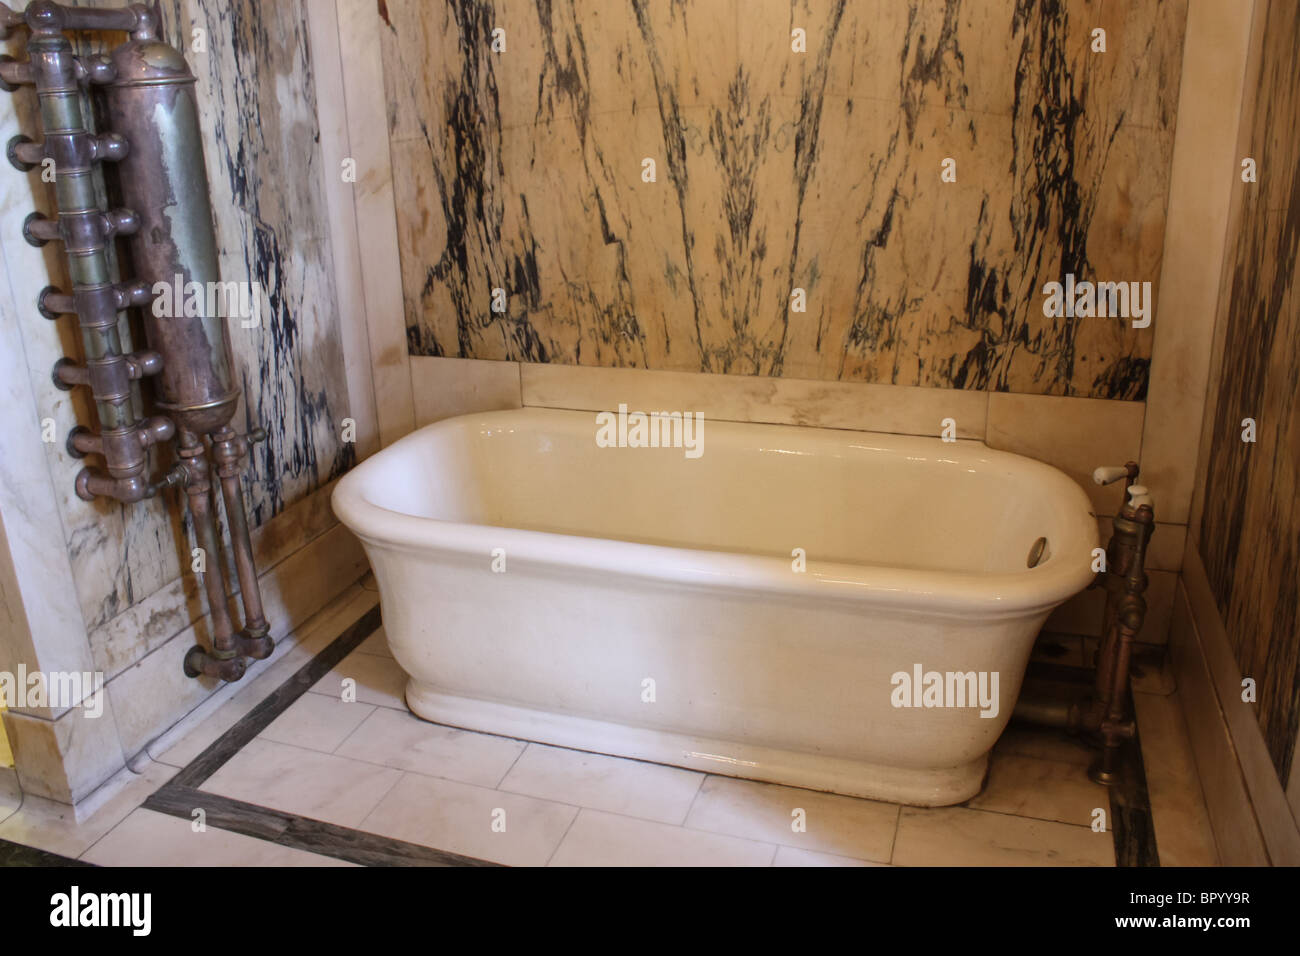 retro vintage white bath tub marble wall - Stock Image